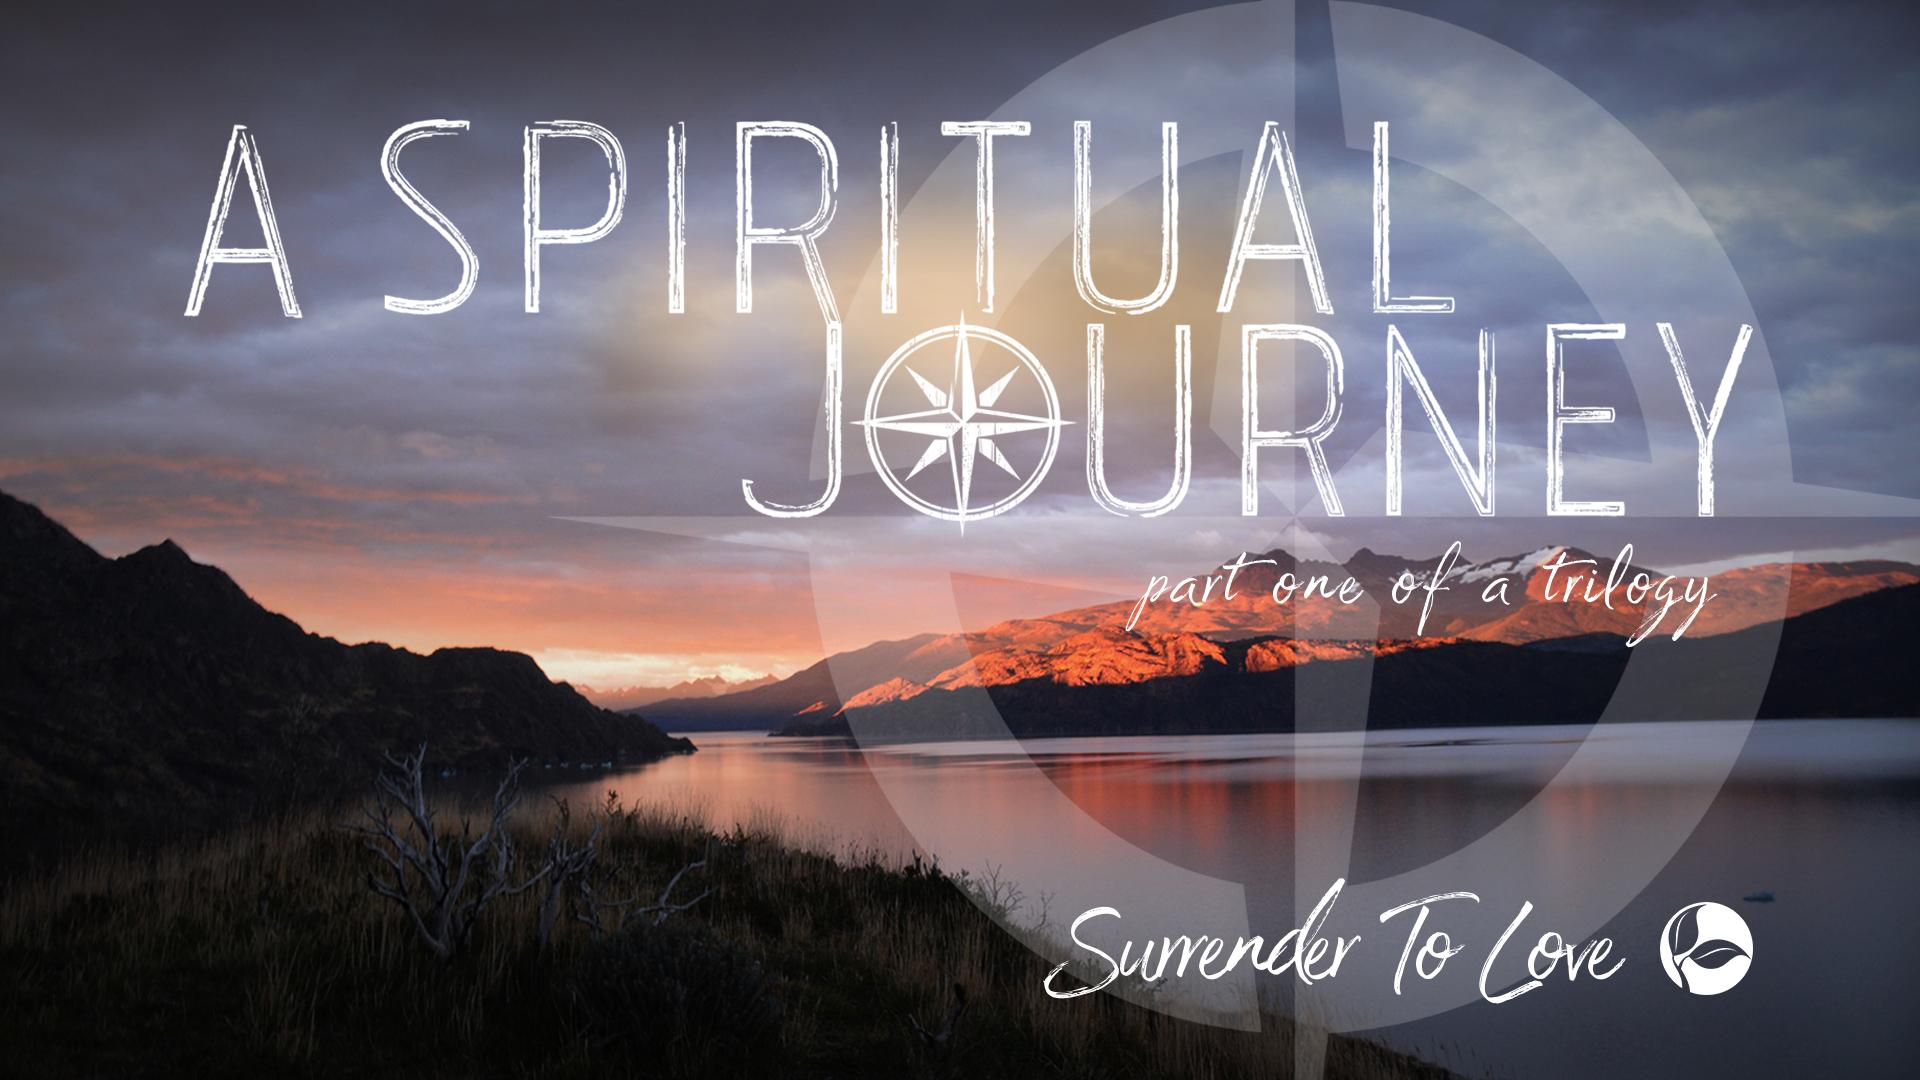 A spiritual journey promo.jpg